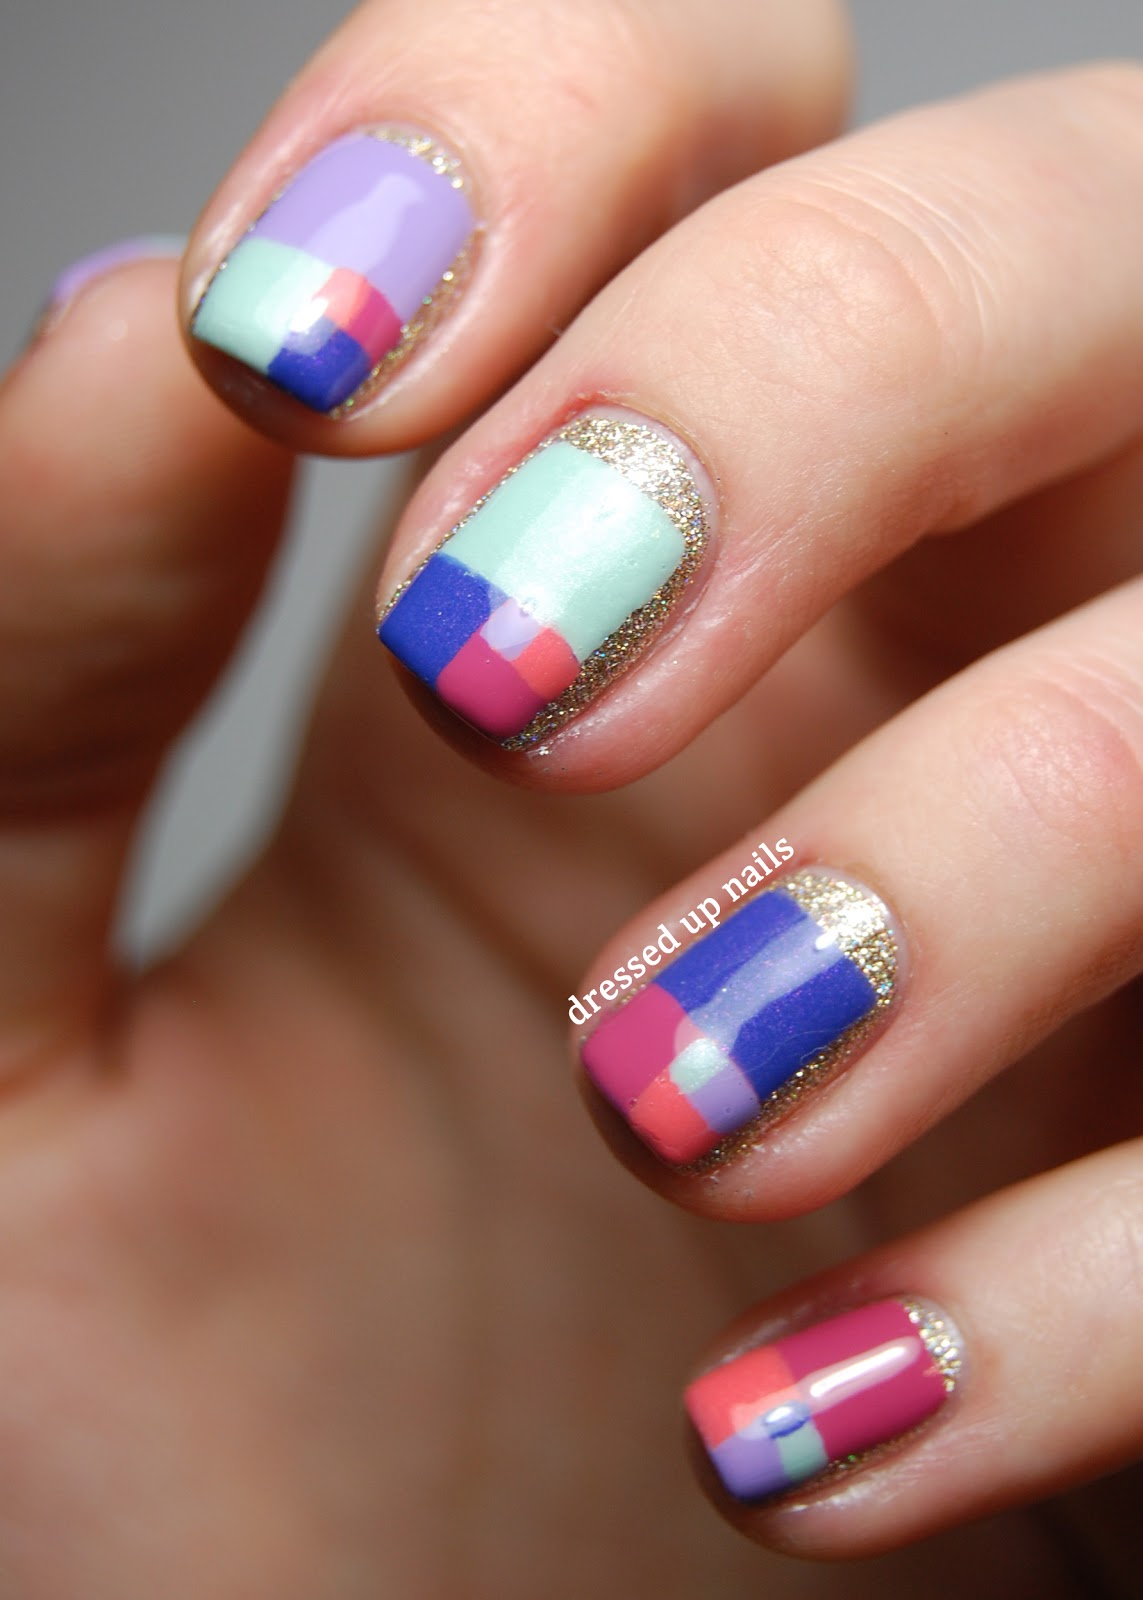 Nail art color violet - Dressed Up Nails Golden Ratio Color Block Pastel Nail Art